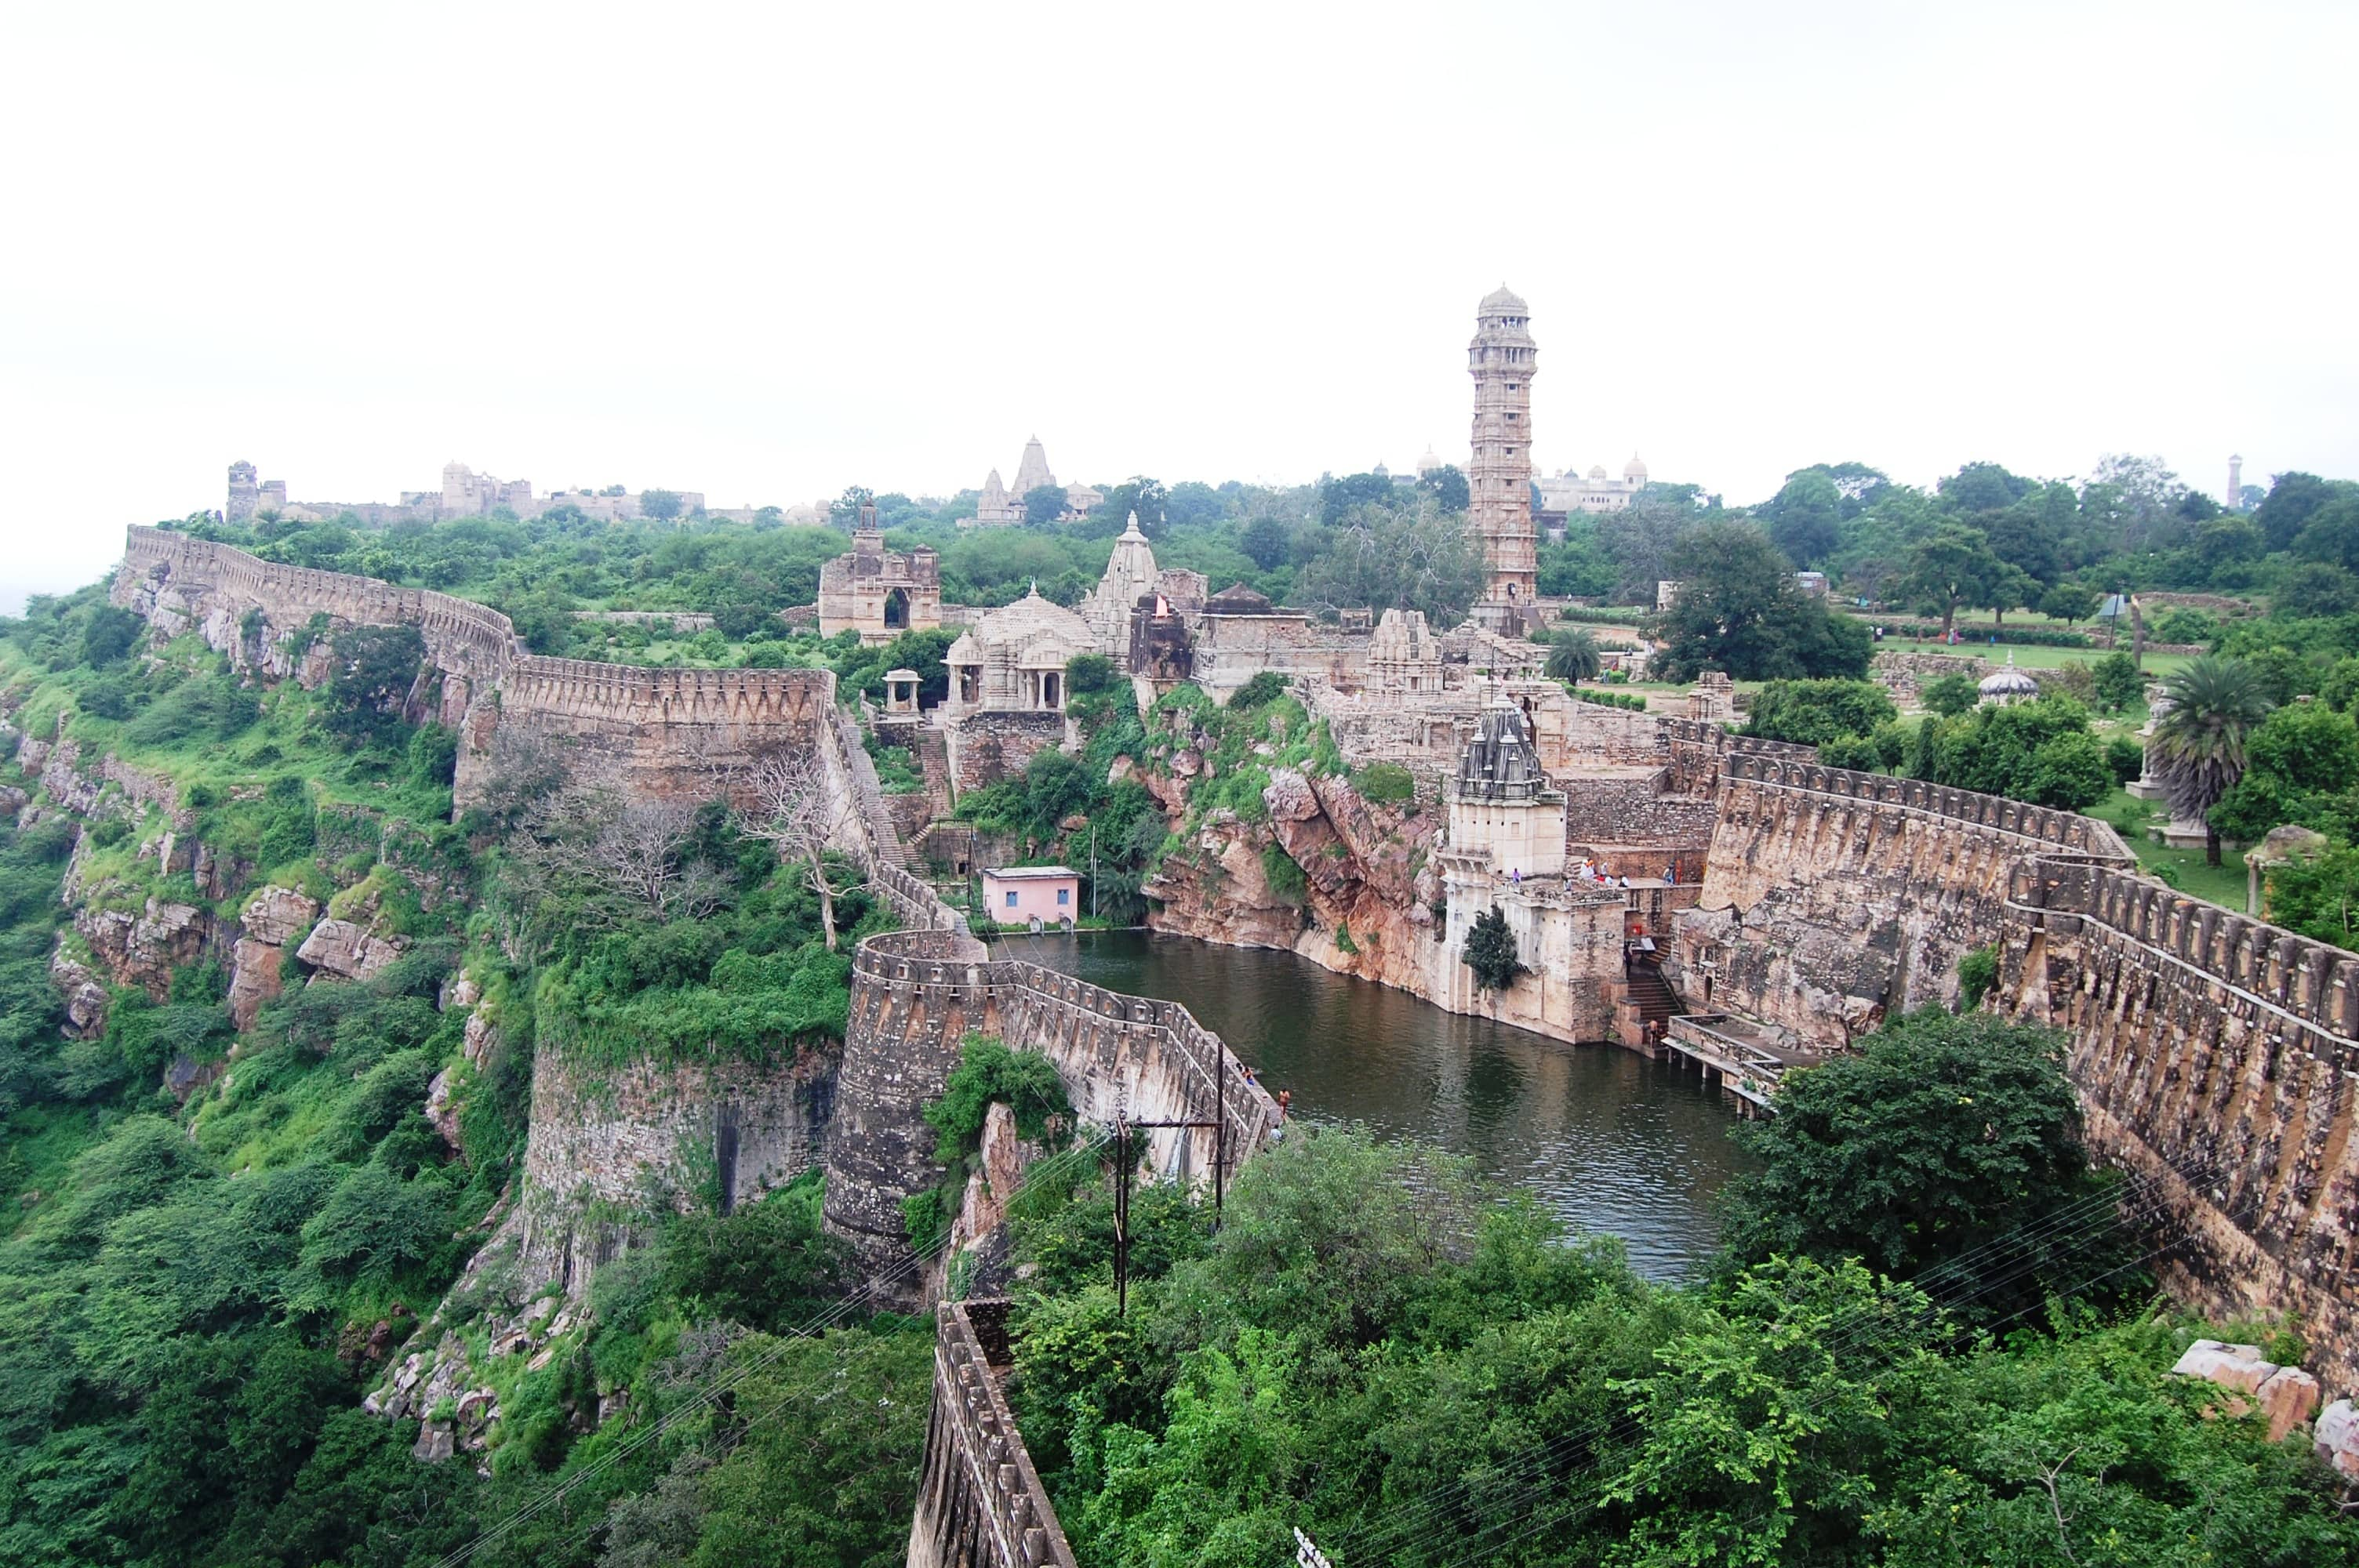 benteng-chittorgarh-the-largest-fort-of-in-secret-world